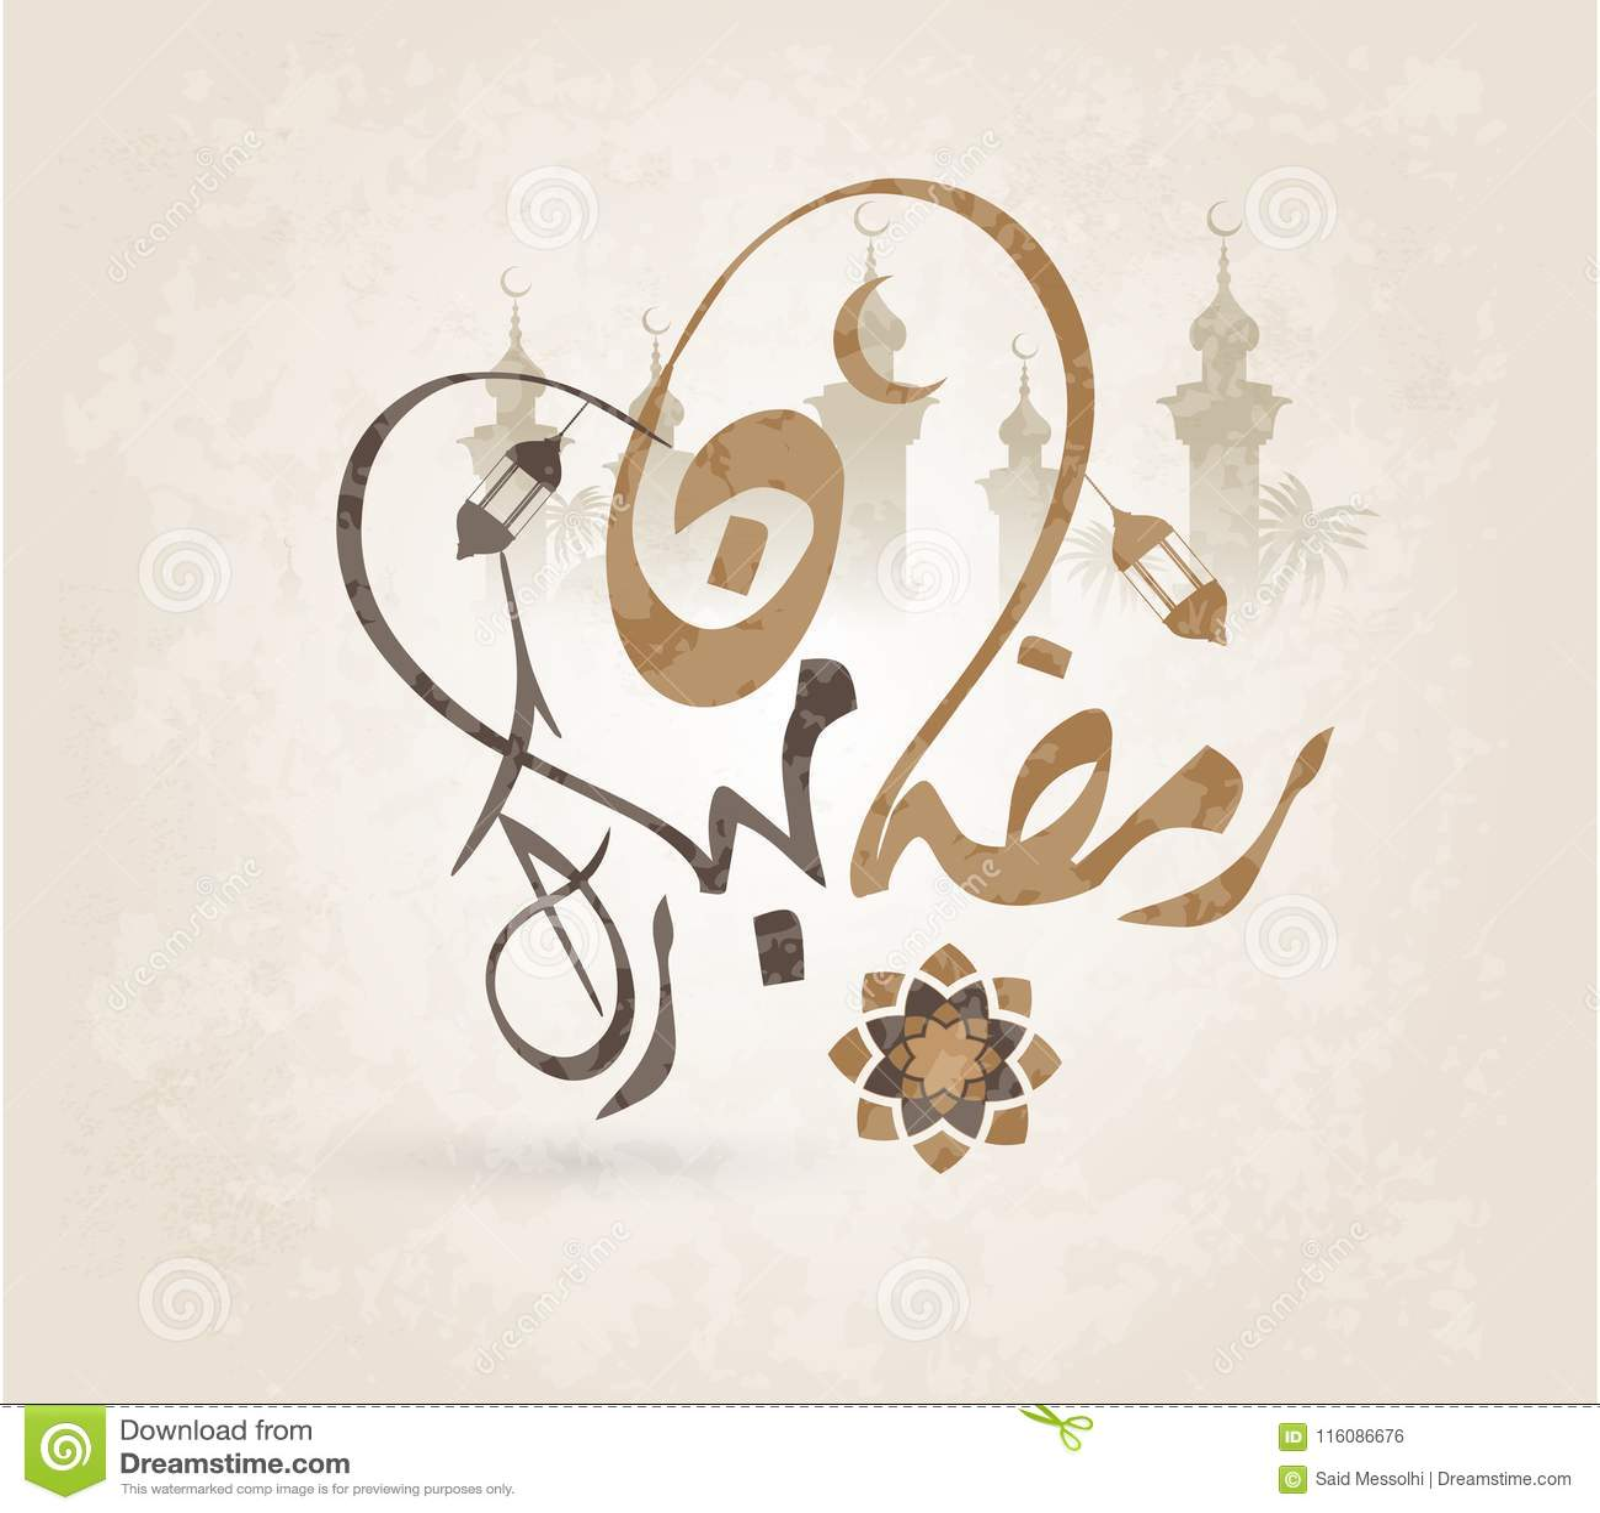 Ramadan Kareem Beautiful Greeting Card Background With Arabic